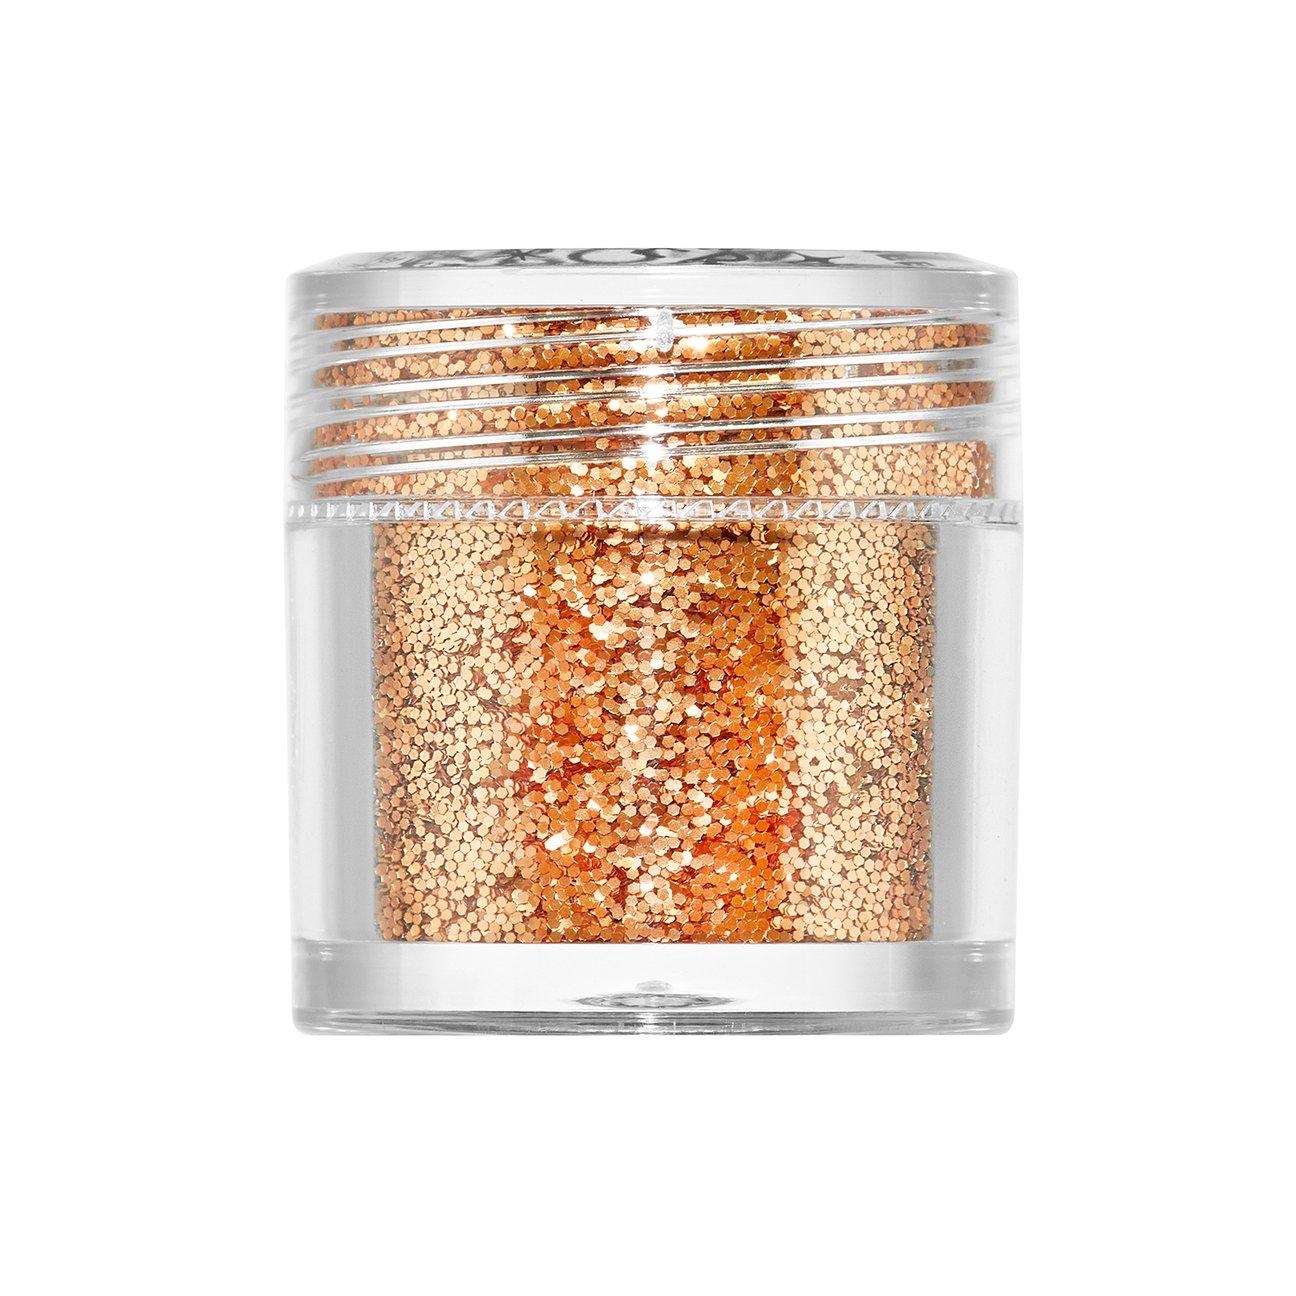 Barry M Biodegradable Body Glitter